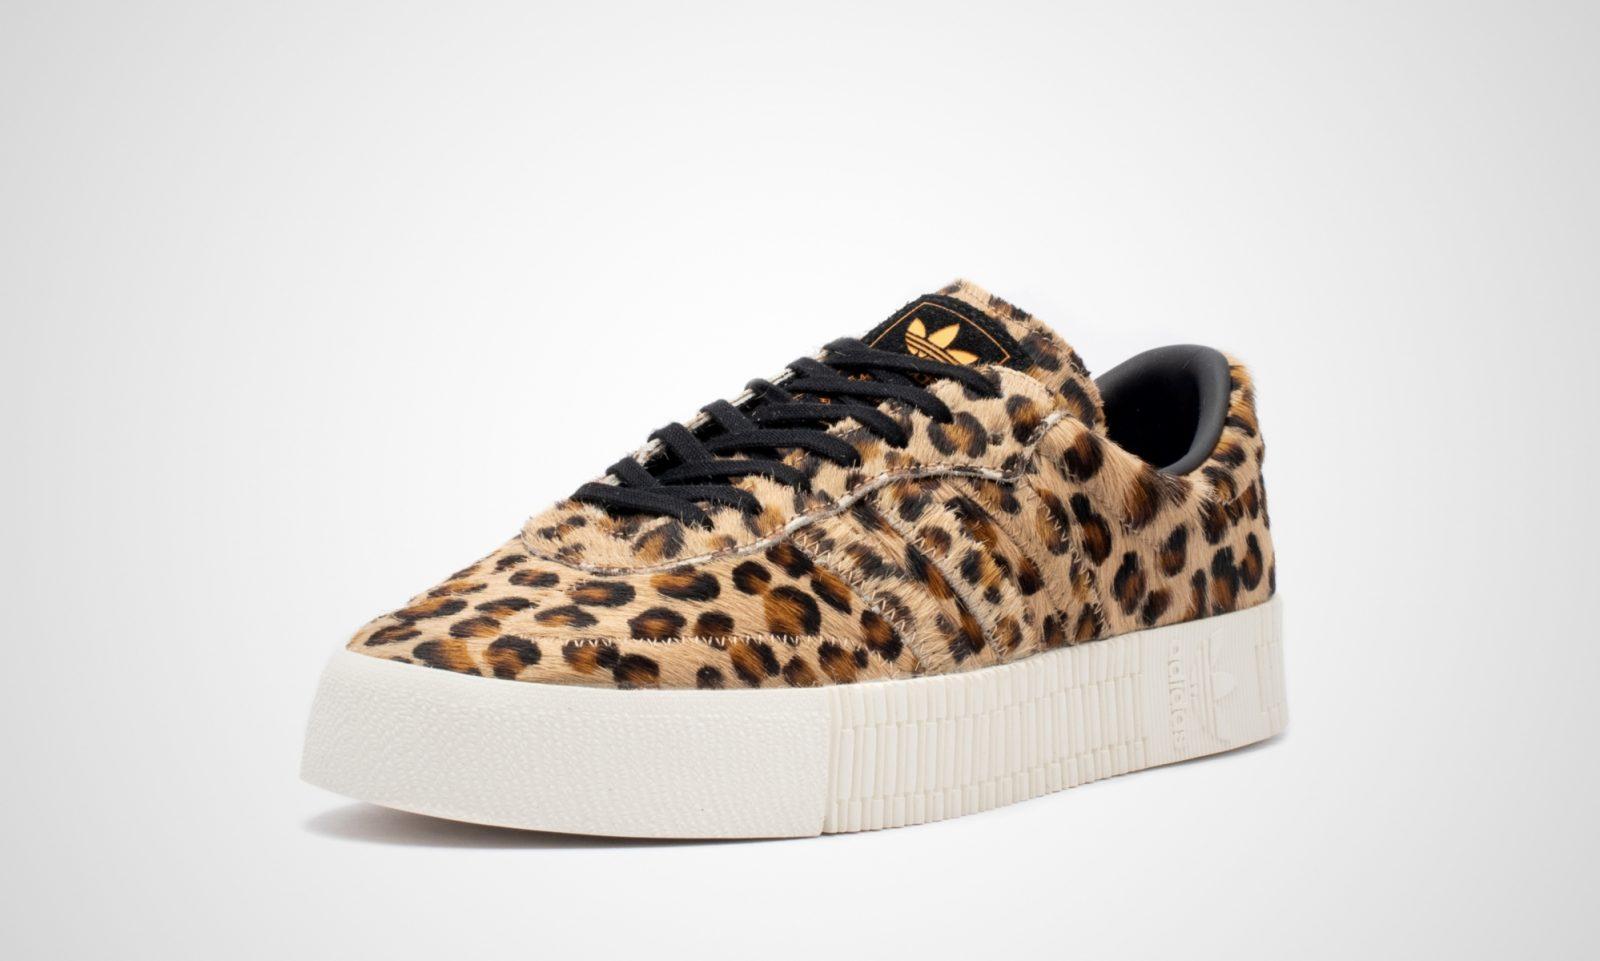 adidas Sambarose Leopard Print   CG6461